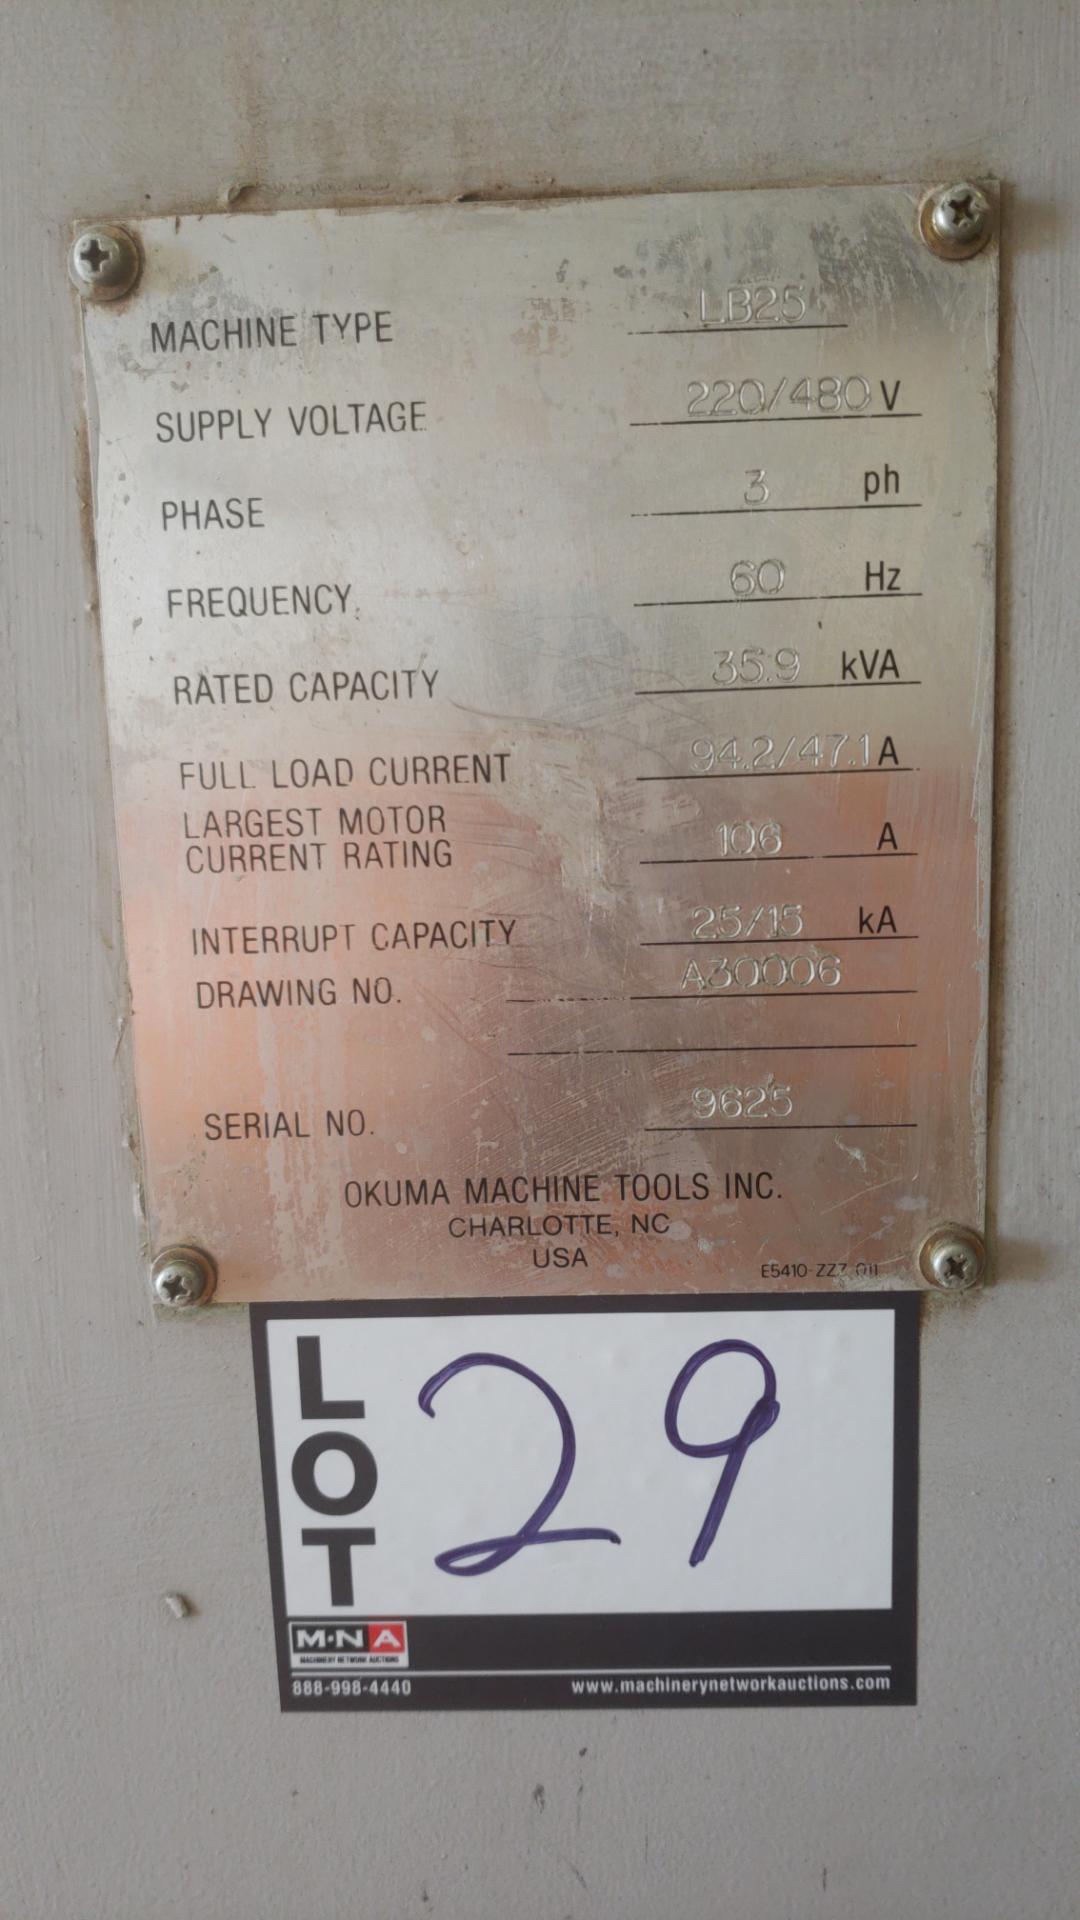 "Okuma LB 25 2 Axis CNC lathe, 5020 control, chip conveyor, 10"" chuck SN: 06119625 - Image 6 of 7"